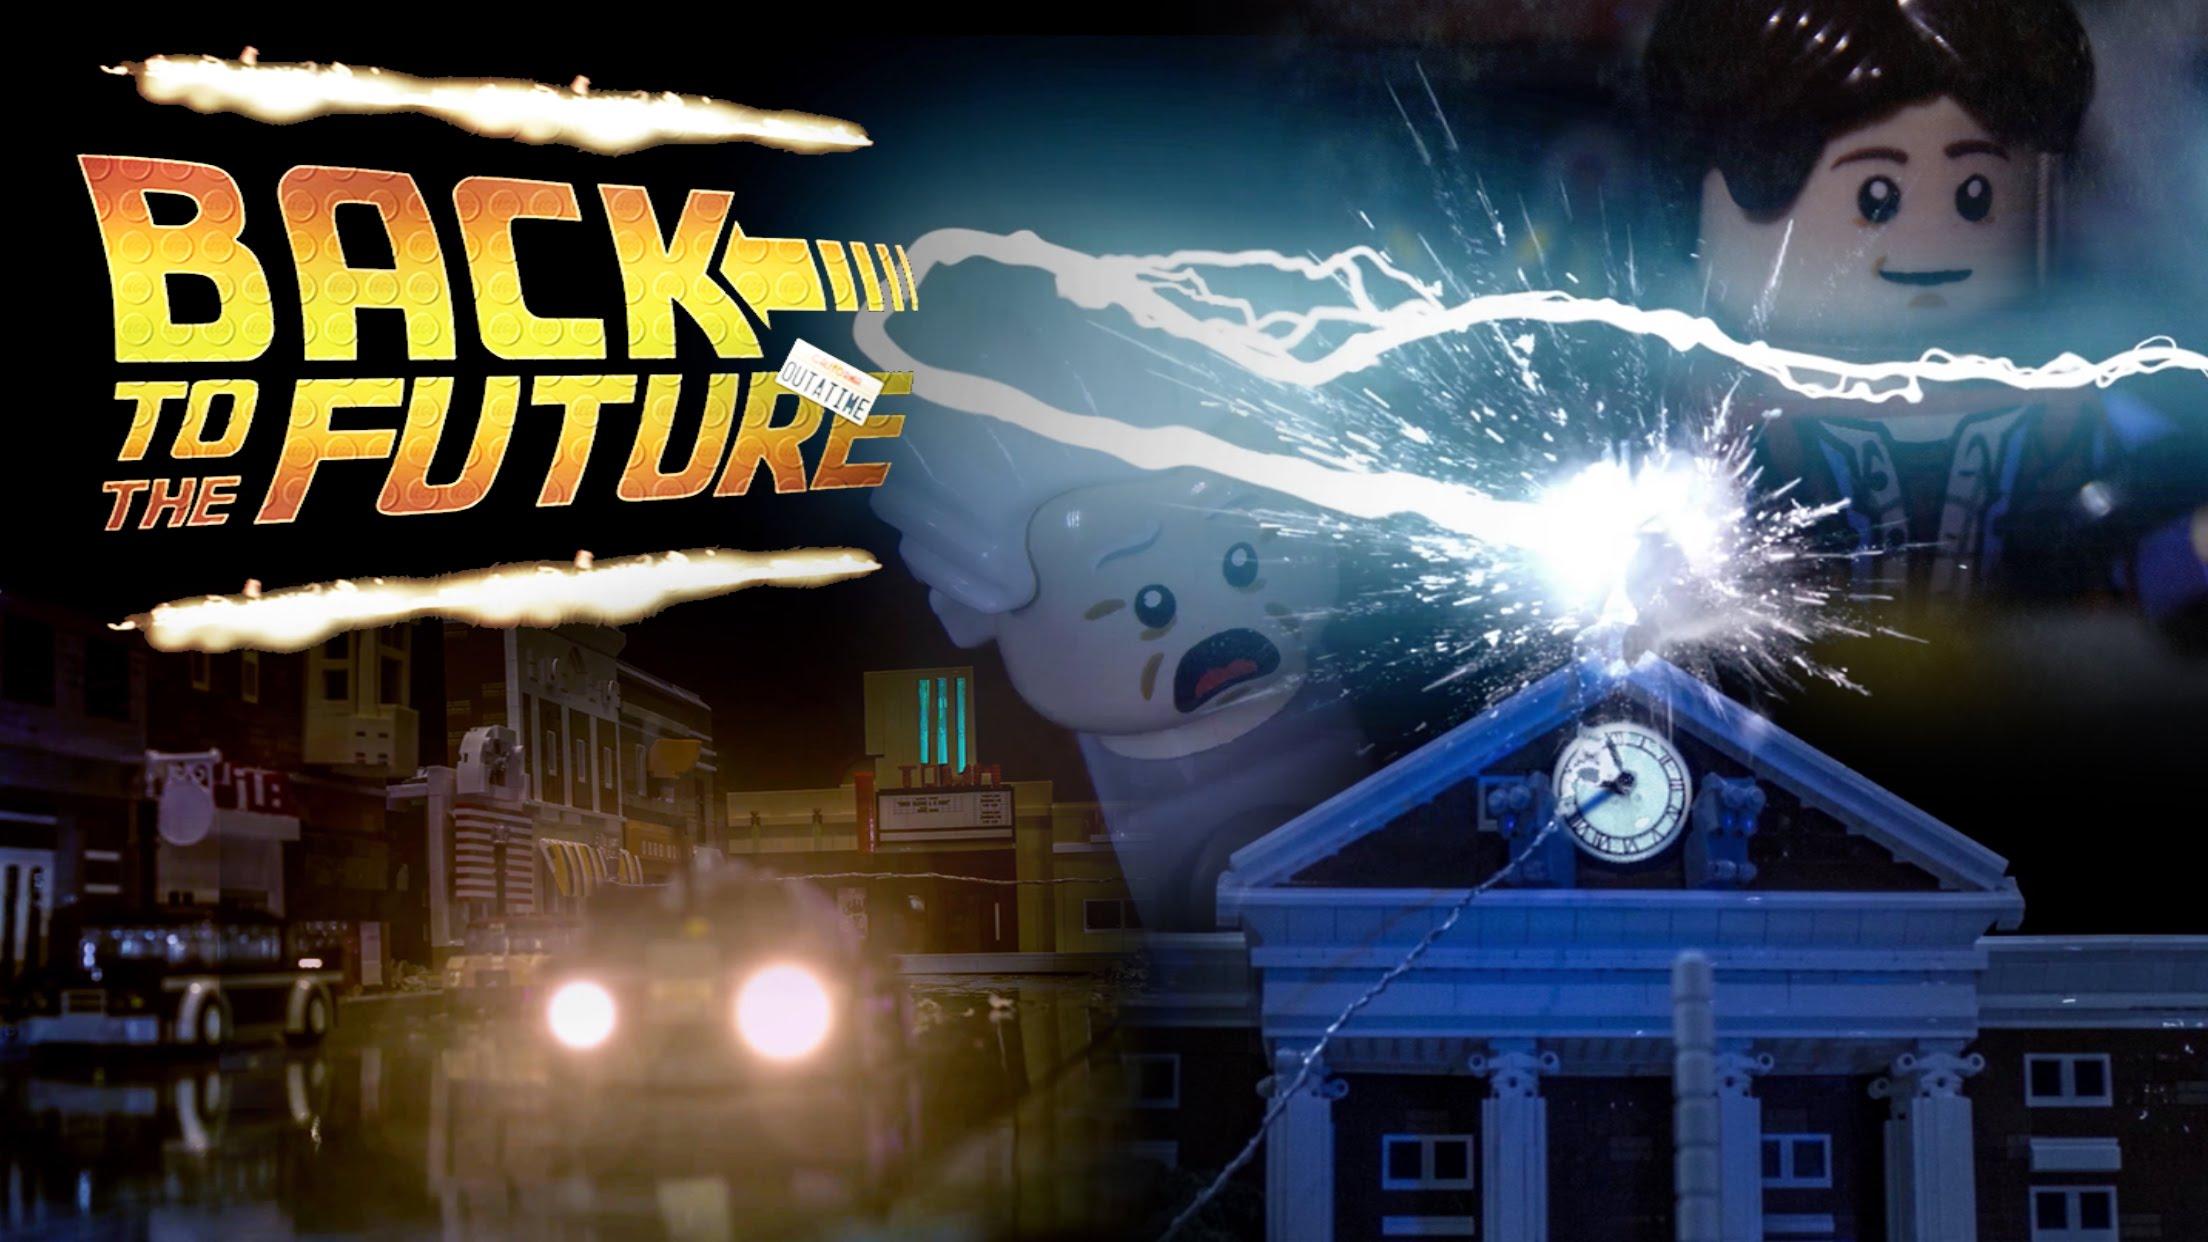 LEGO Back To The Future Remake! #SciFiSunday